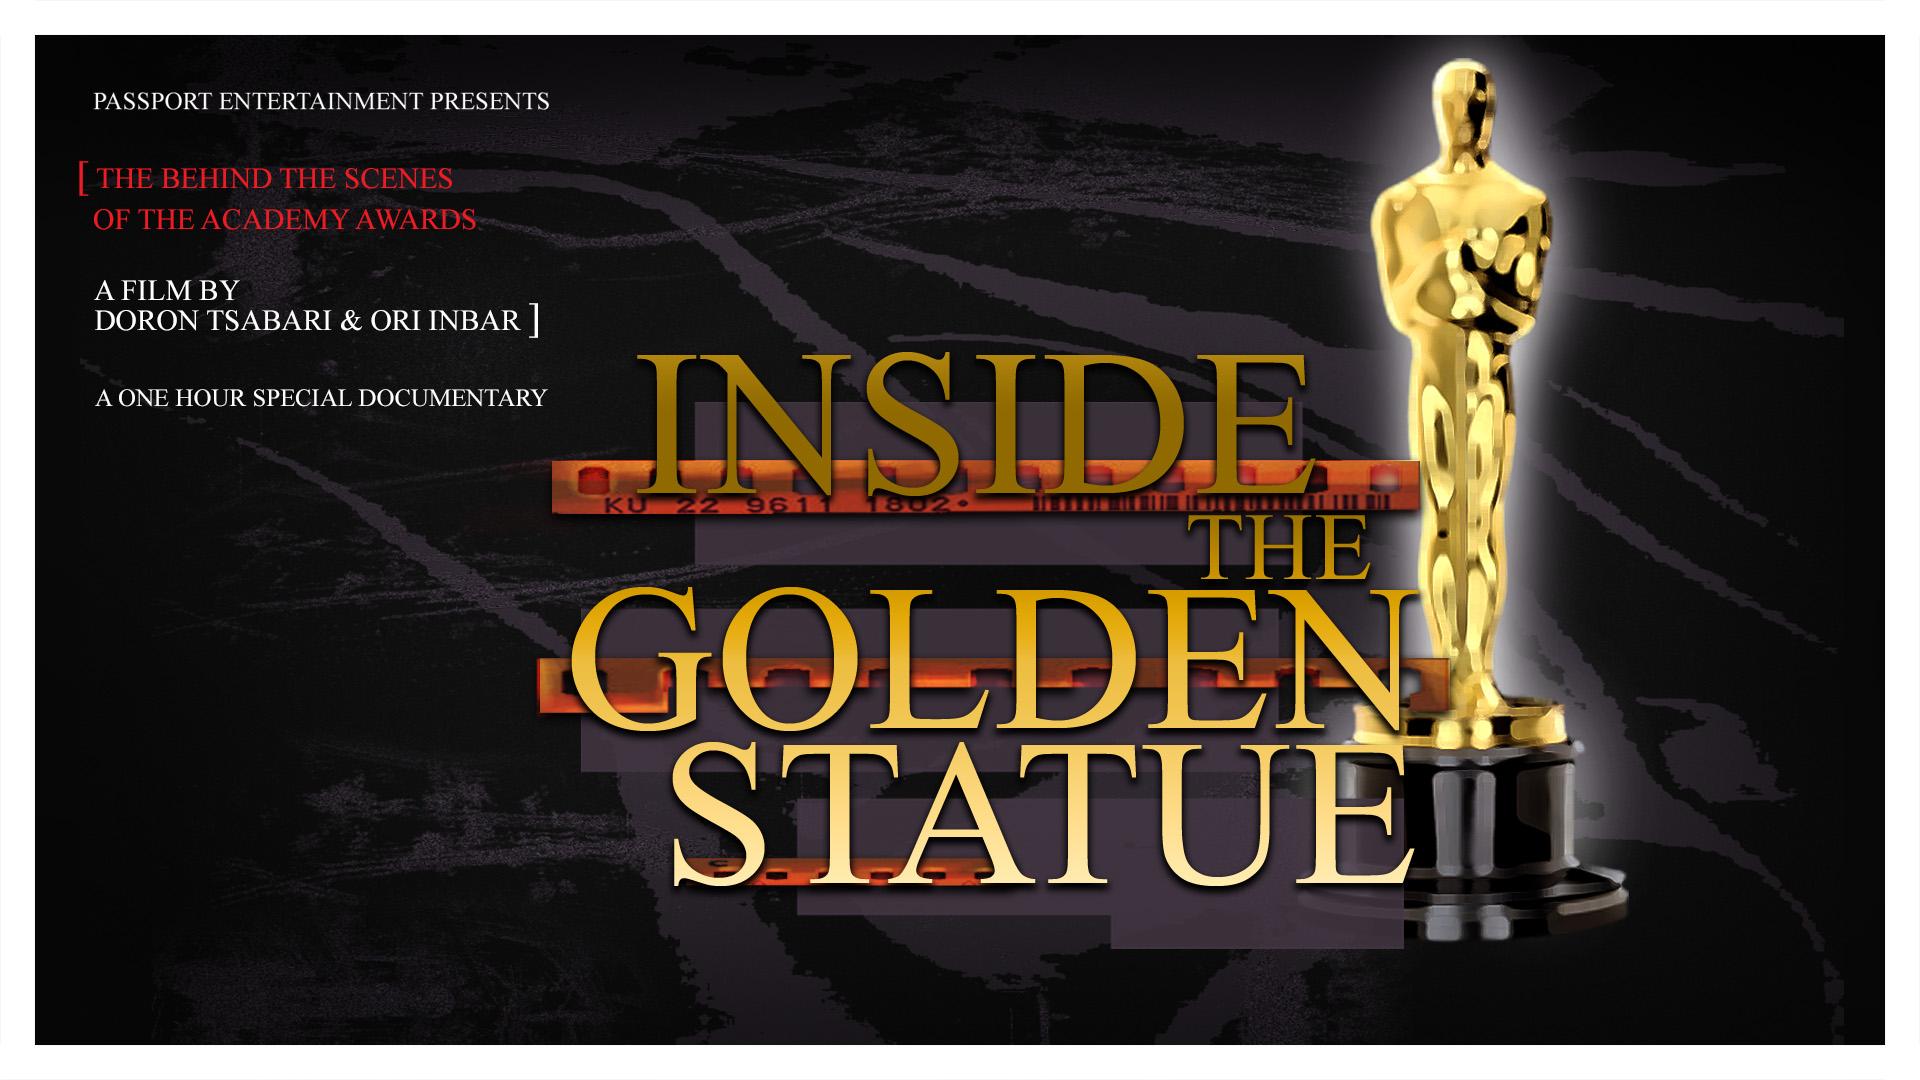 Inside the Golden Statue